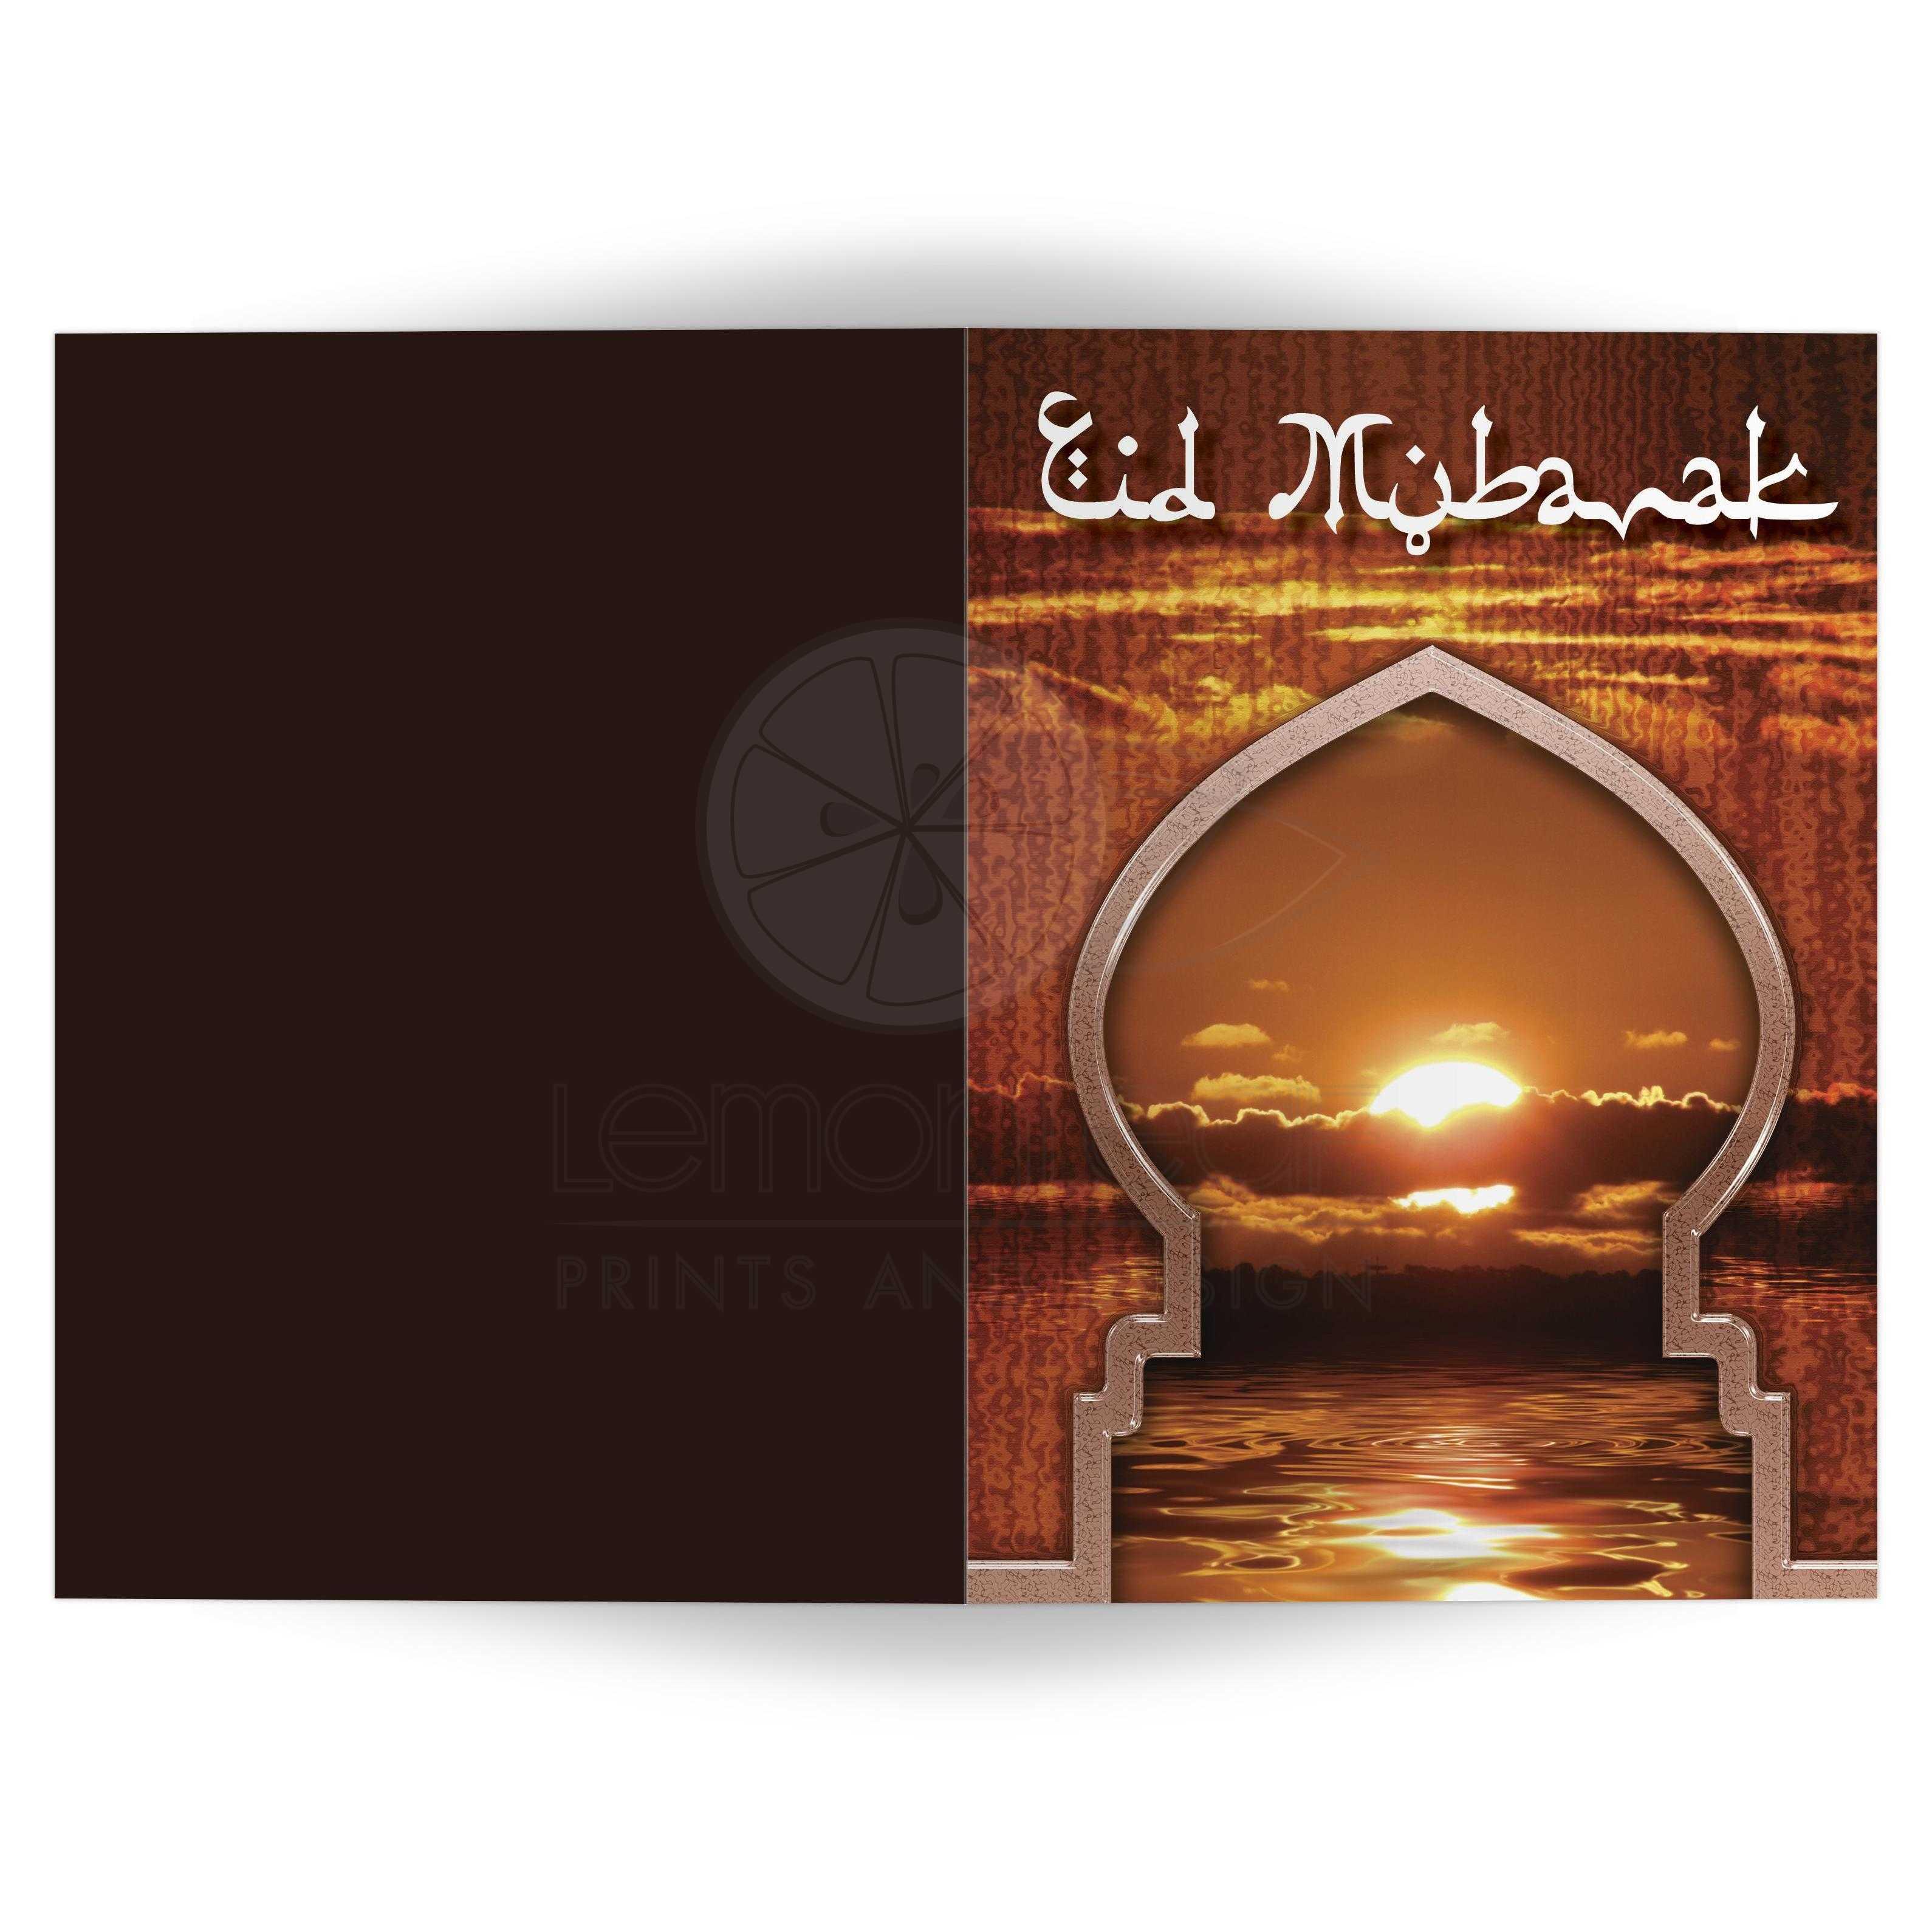 Sunset Eid Mubarak Greeting Card